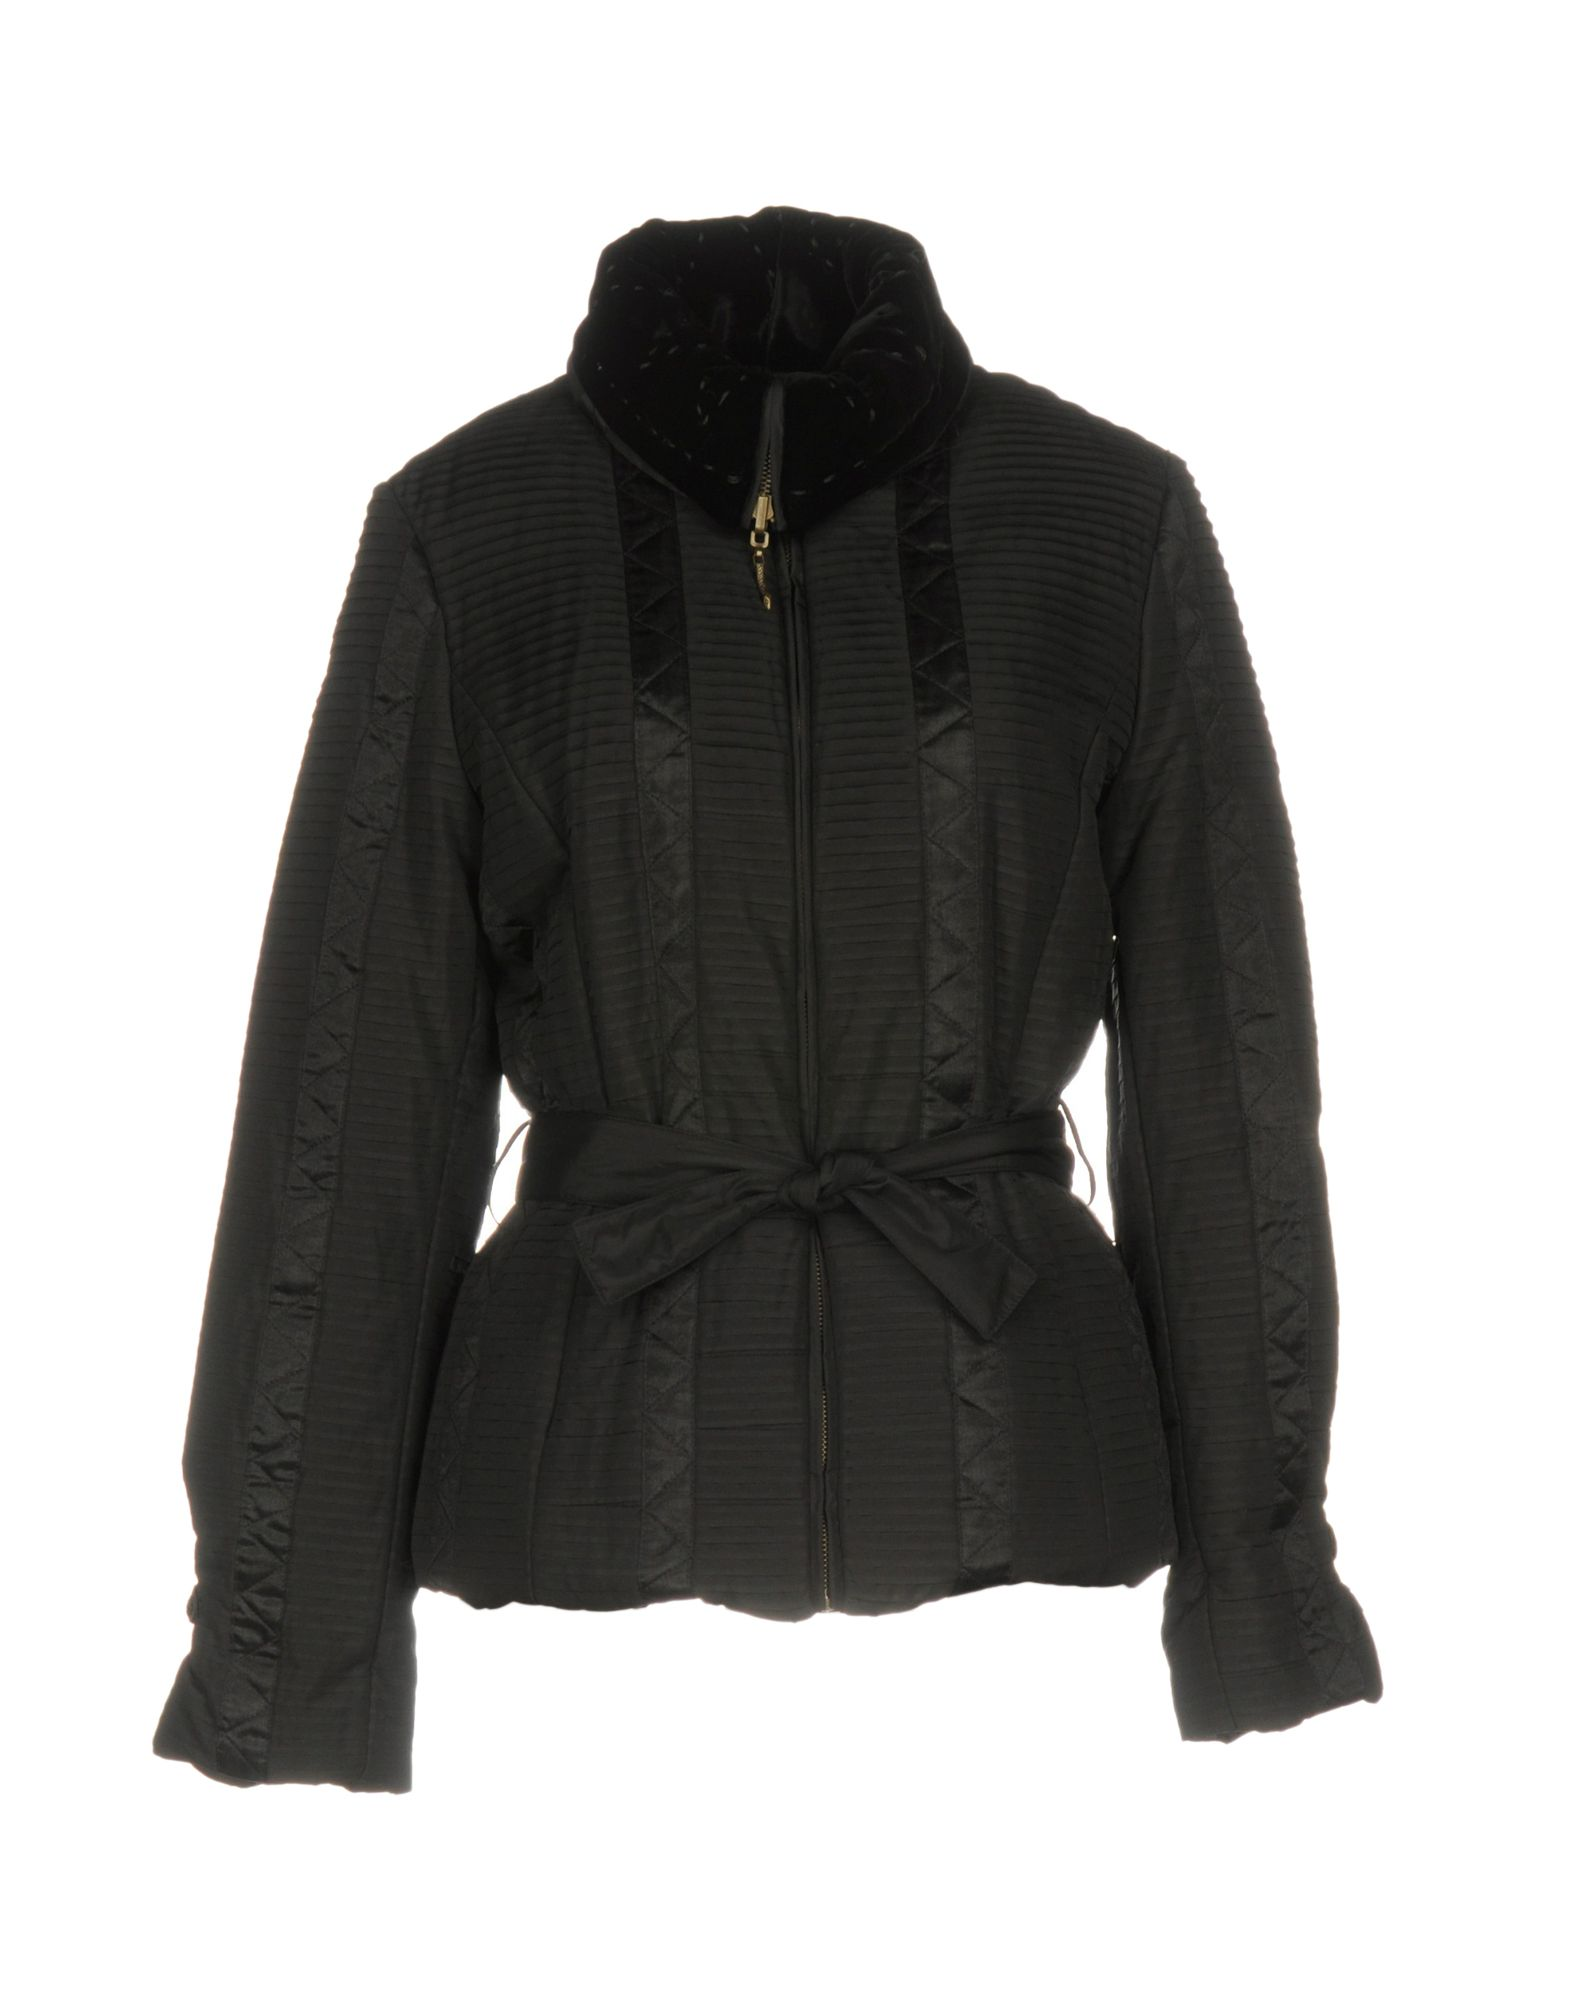 CLASS ROBERTO CAVALLI Damen Jacke Farbe Schwarz Größe 5